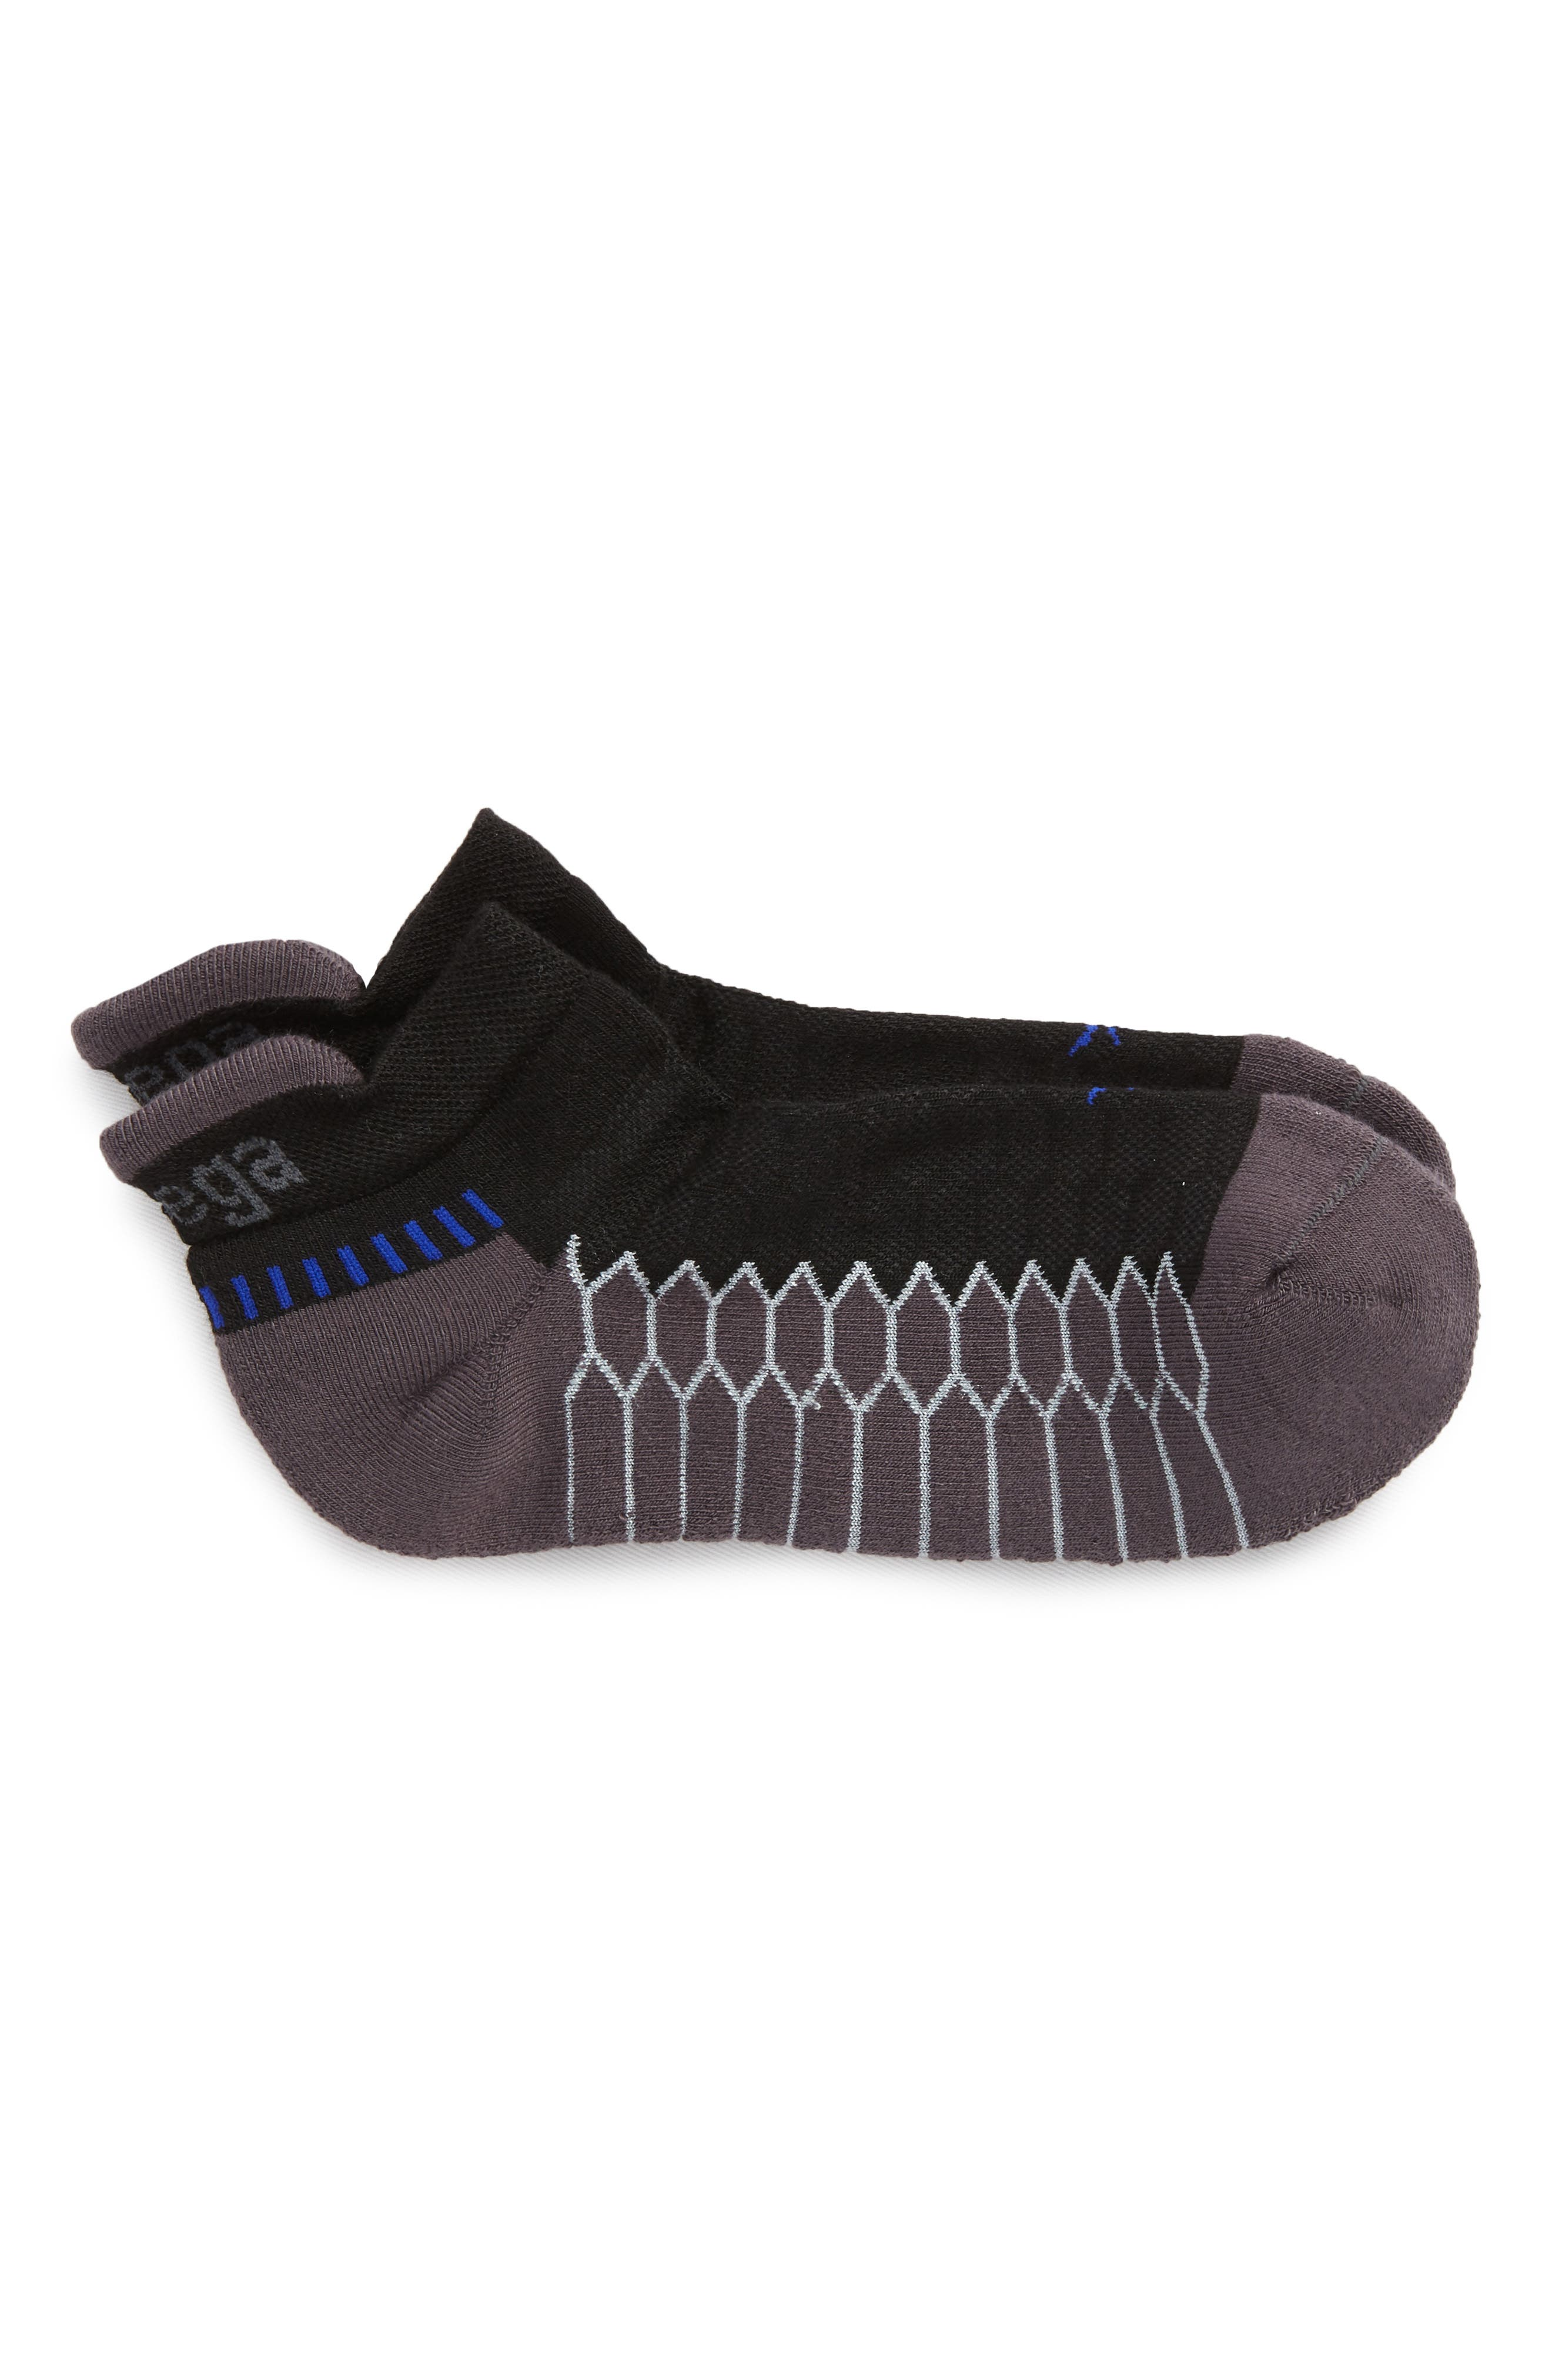 Silver Socks,                         Main,                         color, Black/ Carbon